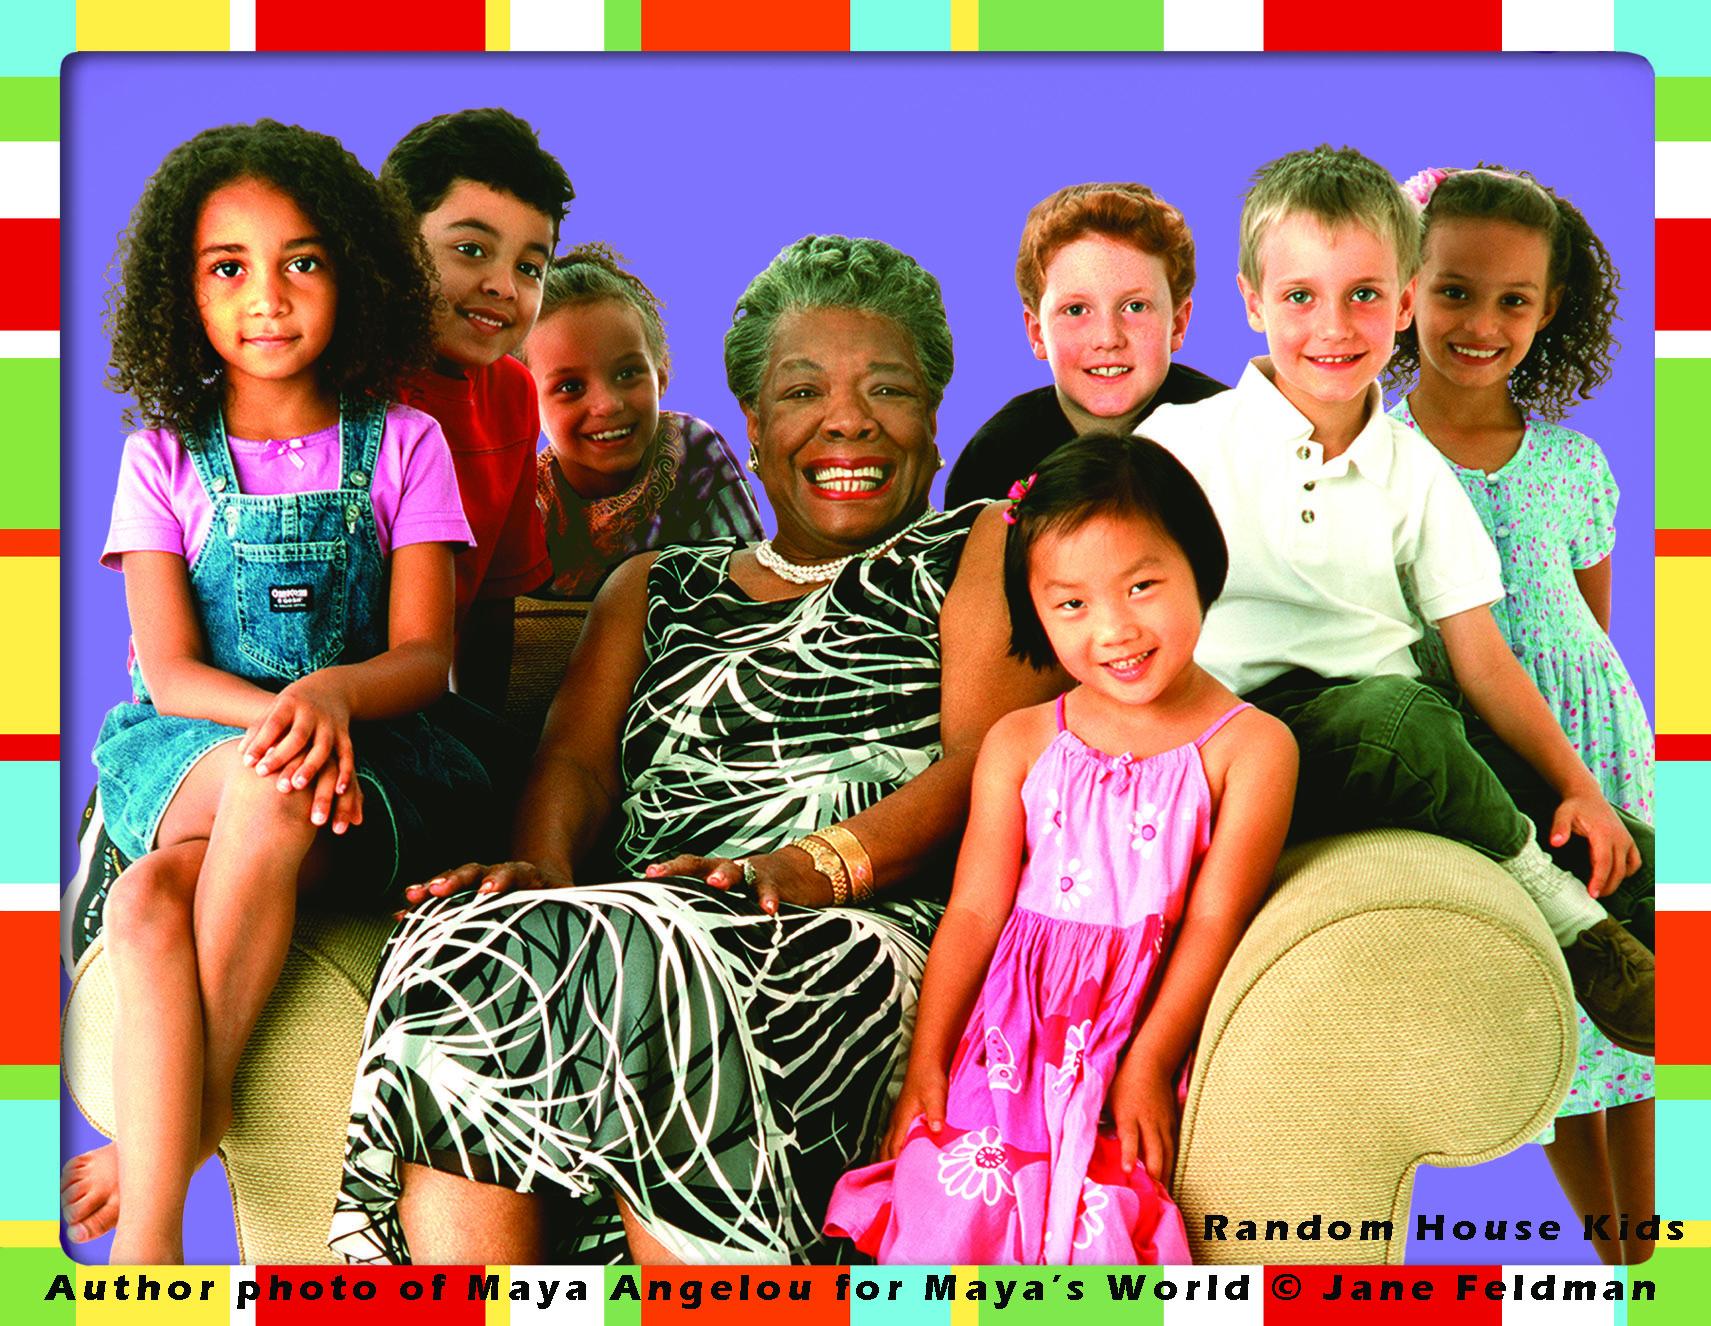 Maya Angelou group w_text.jpg